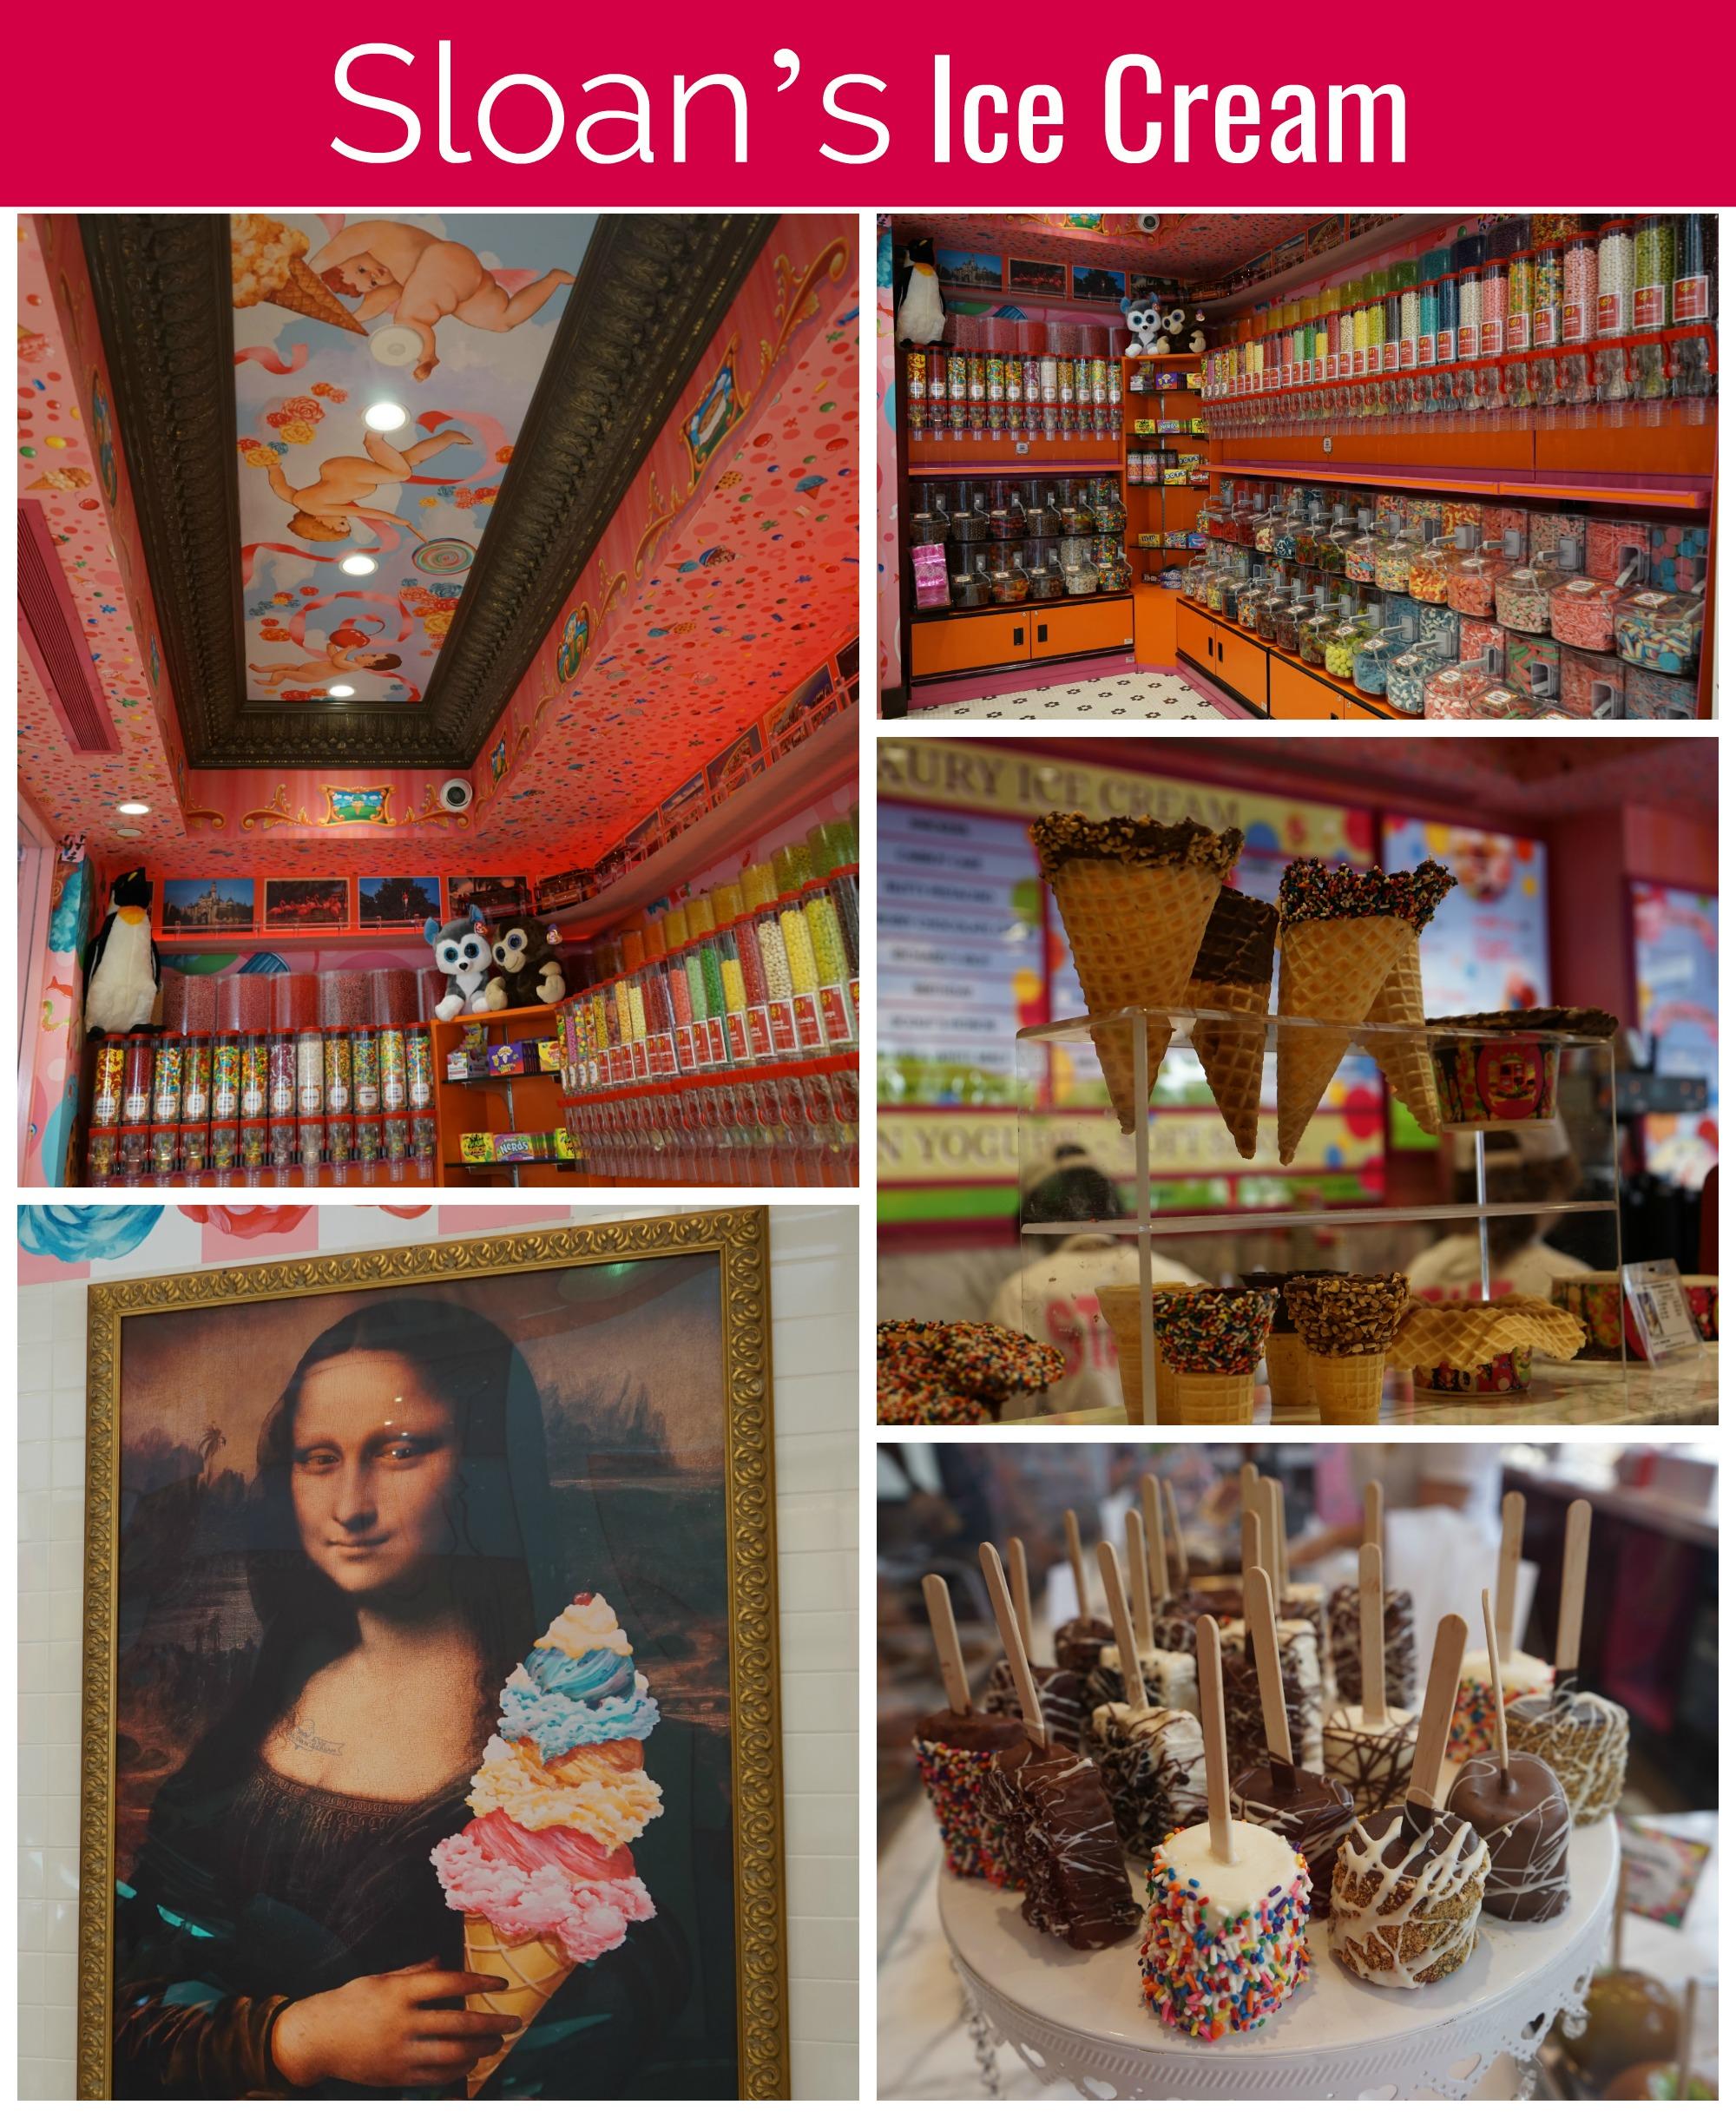 Sloan's Ice Cream llega a Santa Mónica